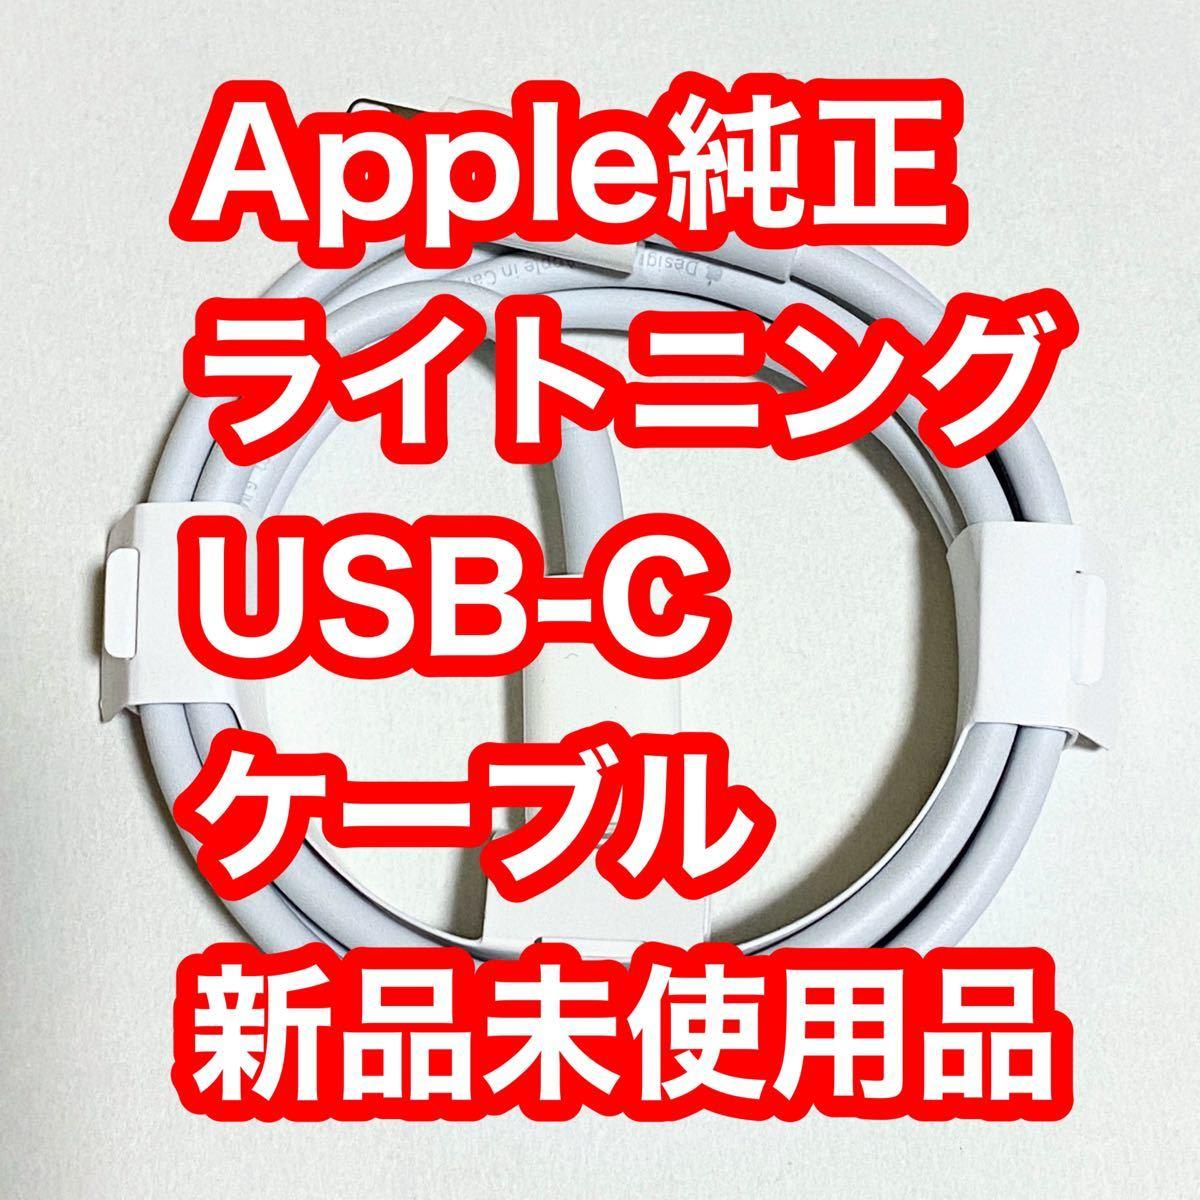 USB-C - Lightningケーブル(1 m) Apple純正品 新品 未使用